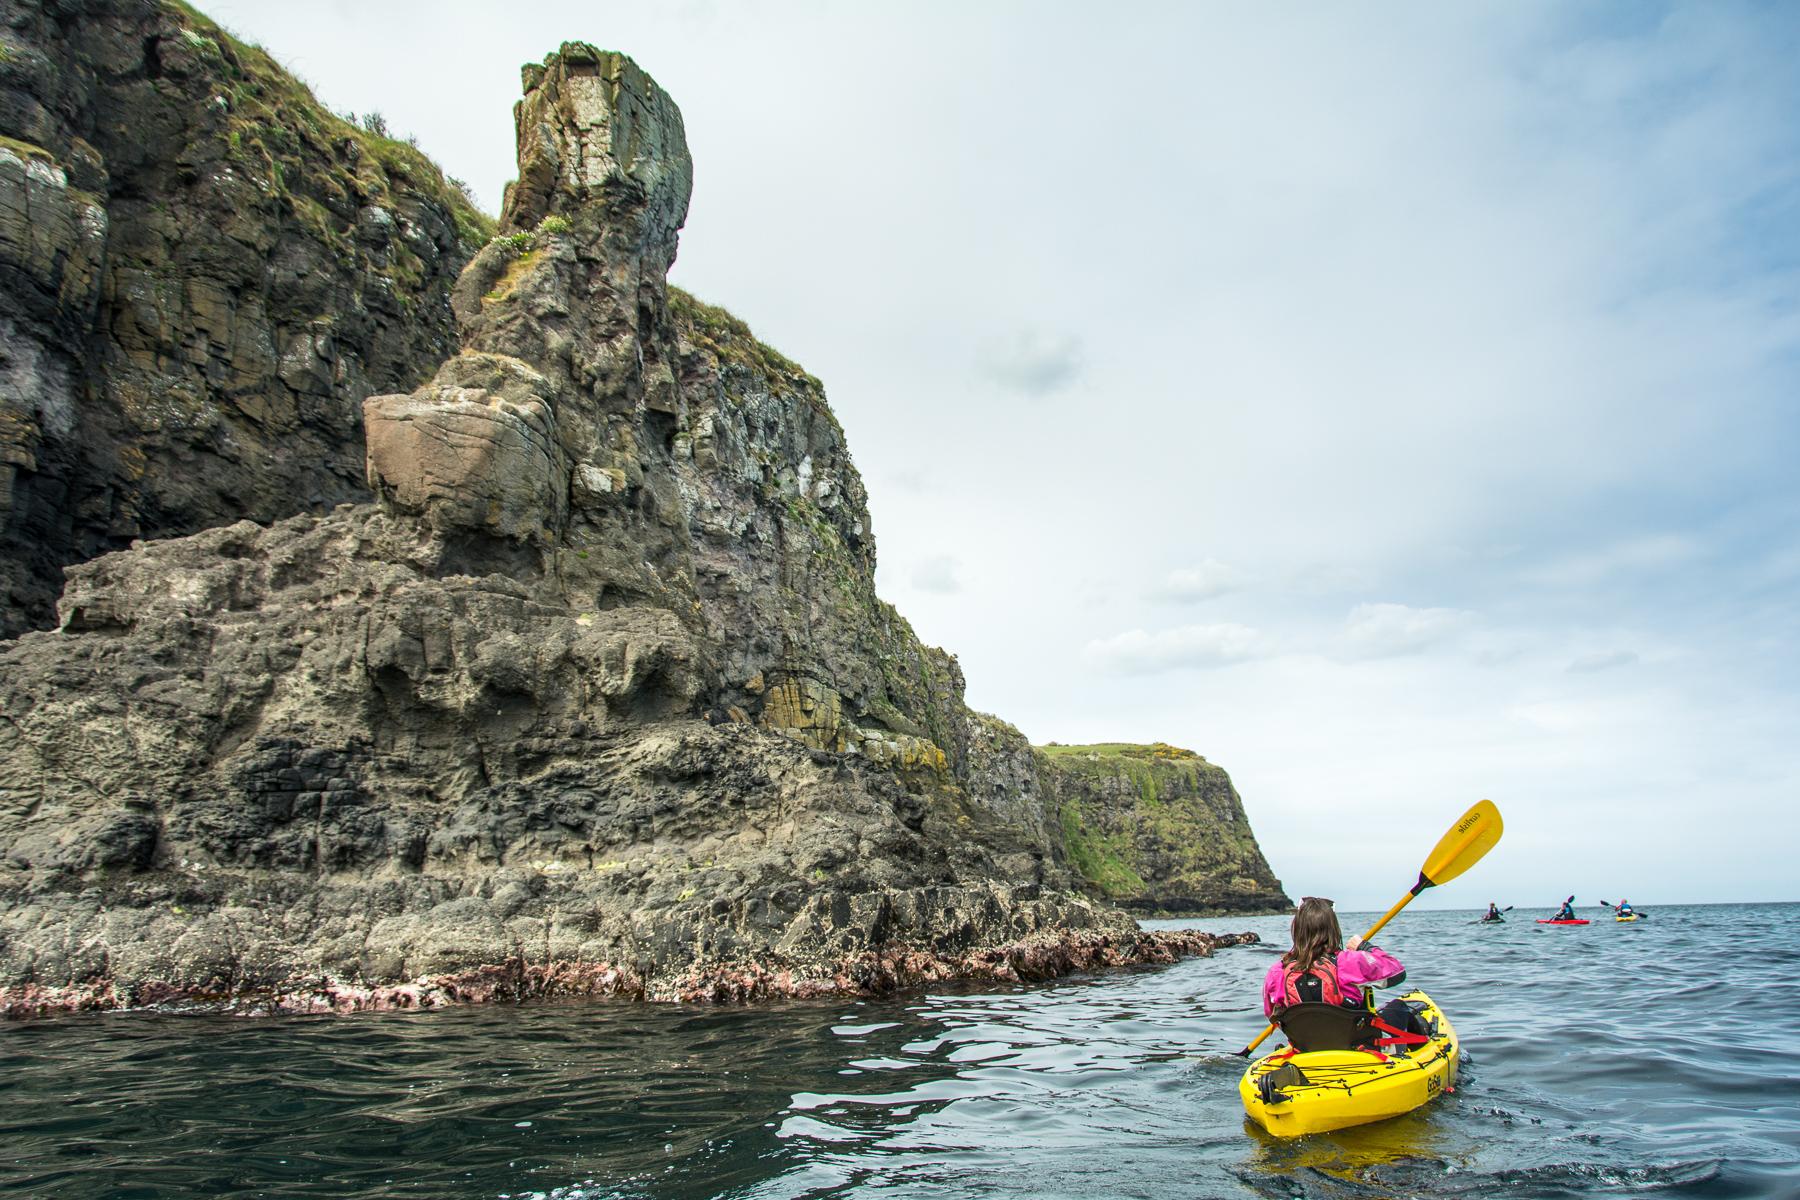 Kayak Tours Northern Ireland by Bout Yeh photographers - photo 7870